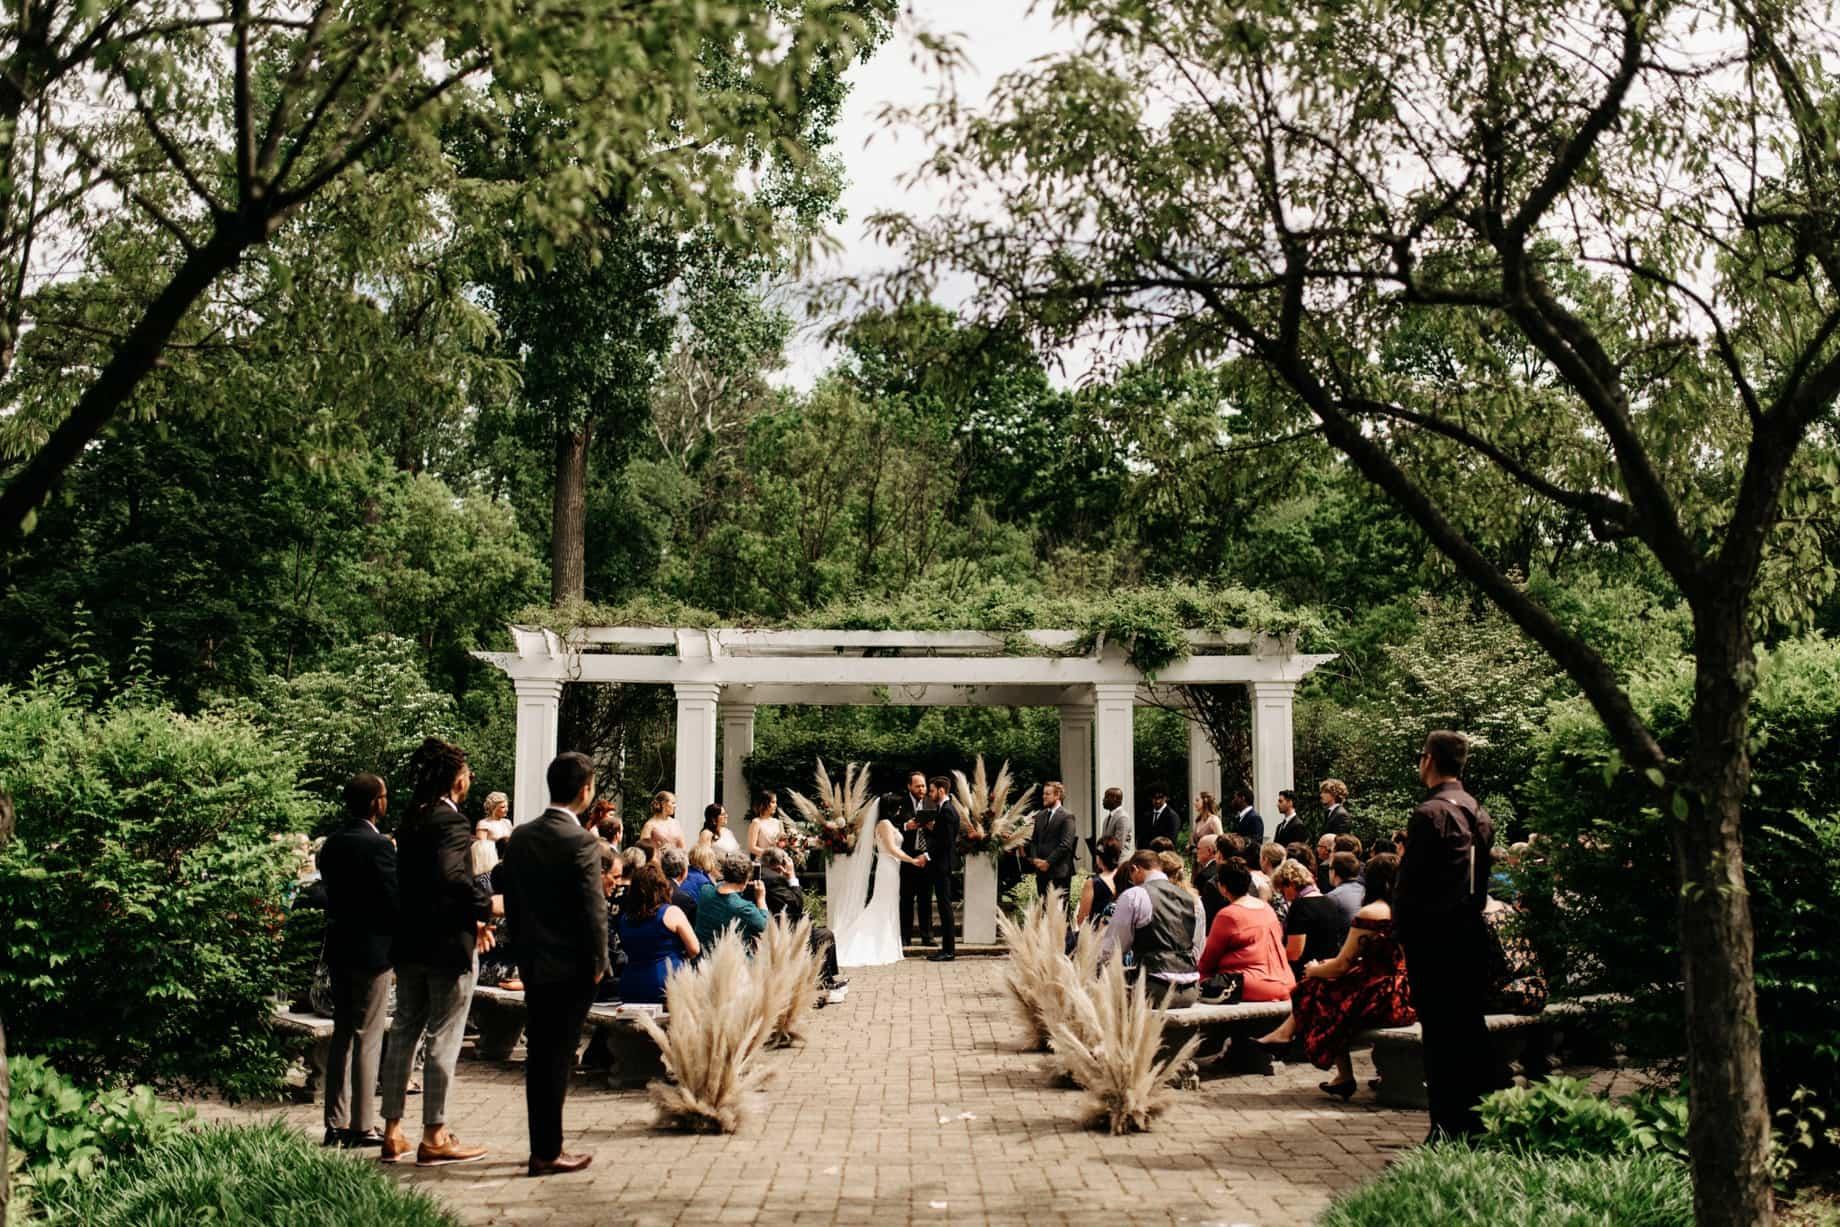 wedding ceremony under the pergola at wellers in saline michigan